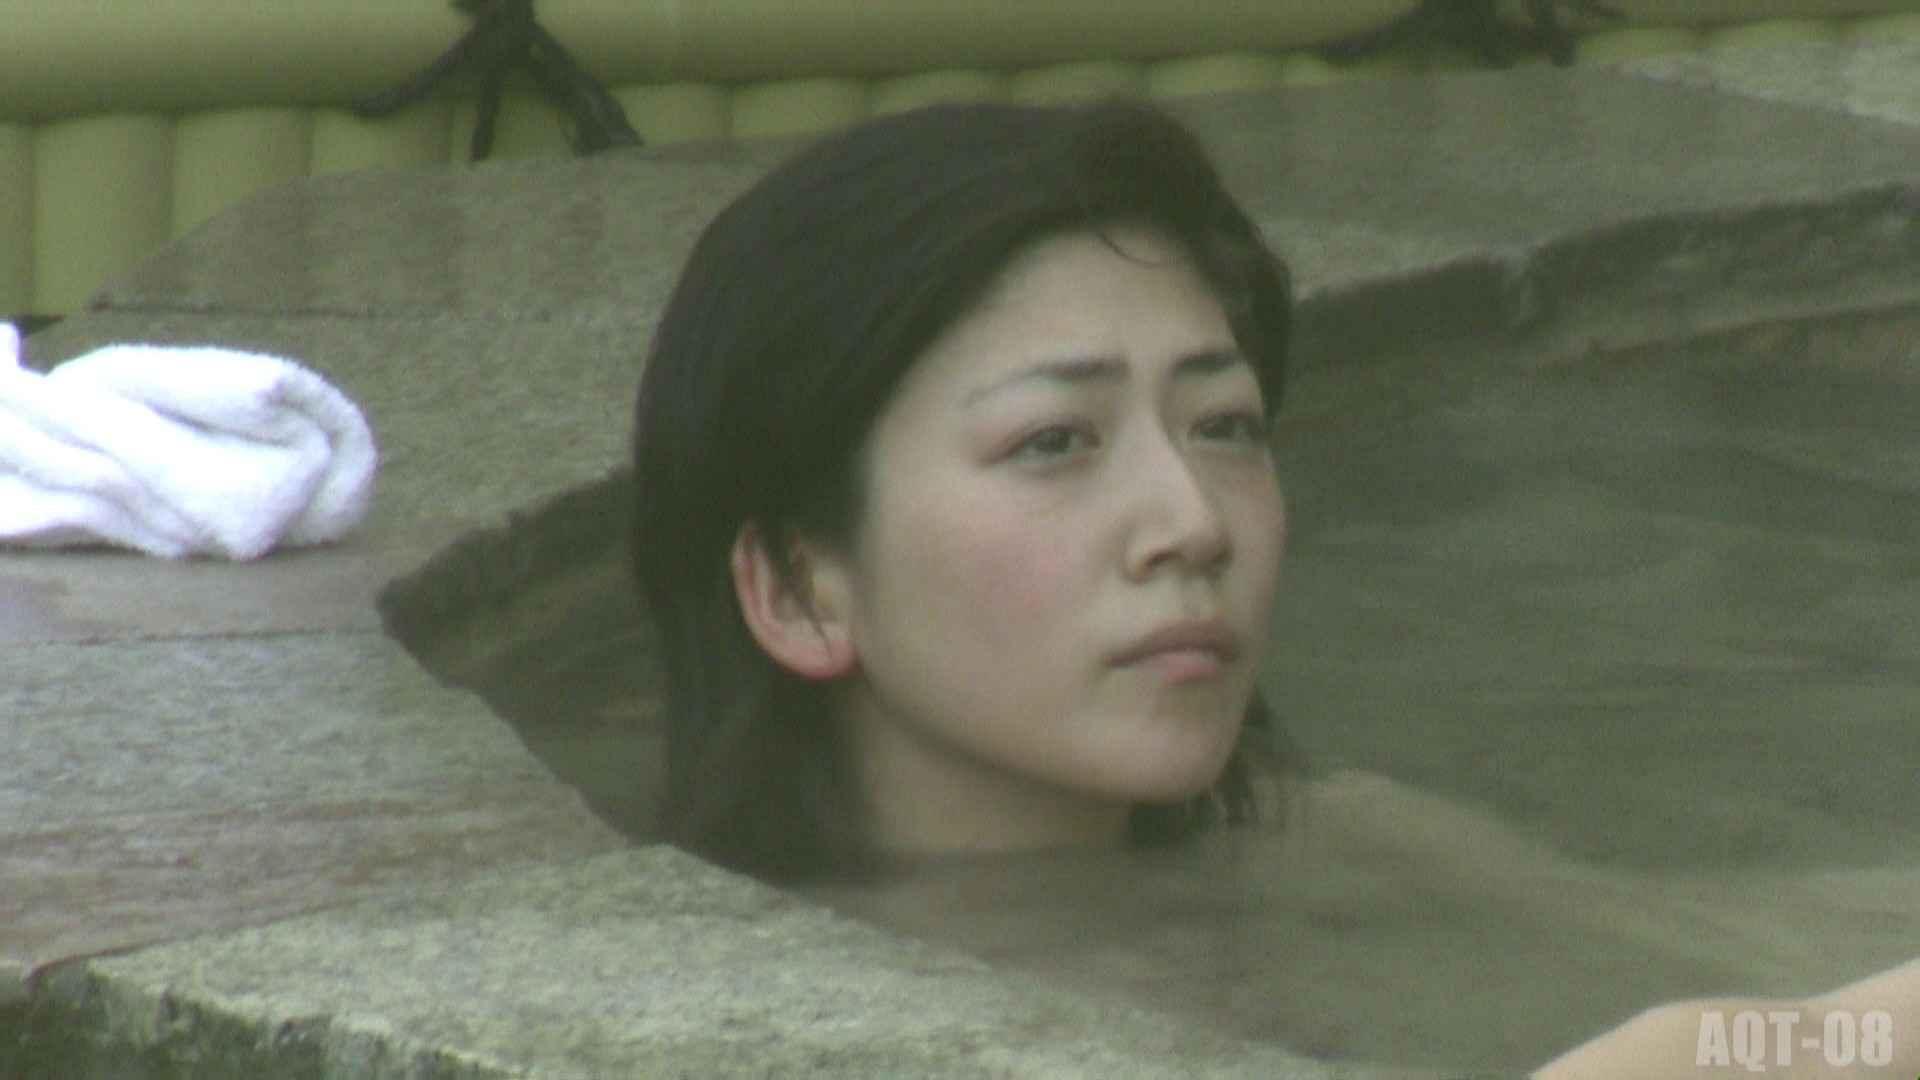 Aquaな露天風呂Vol.776 盗撮 | HなOL  60pic 15